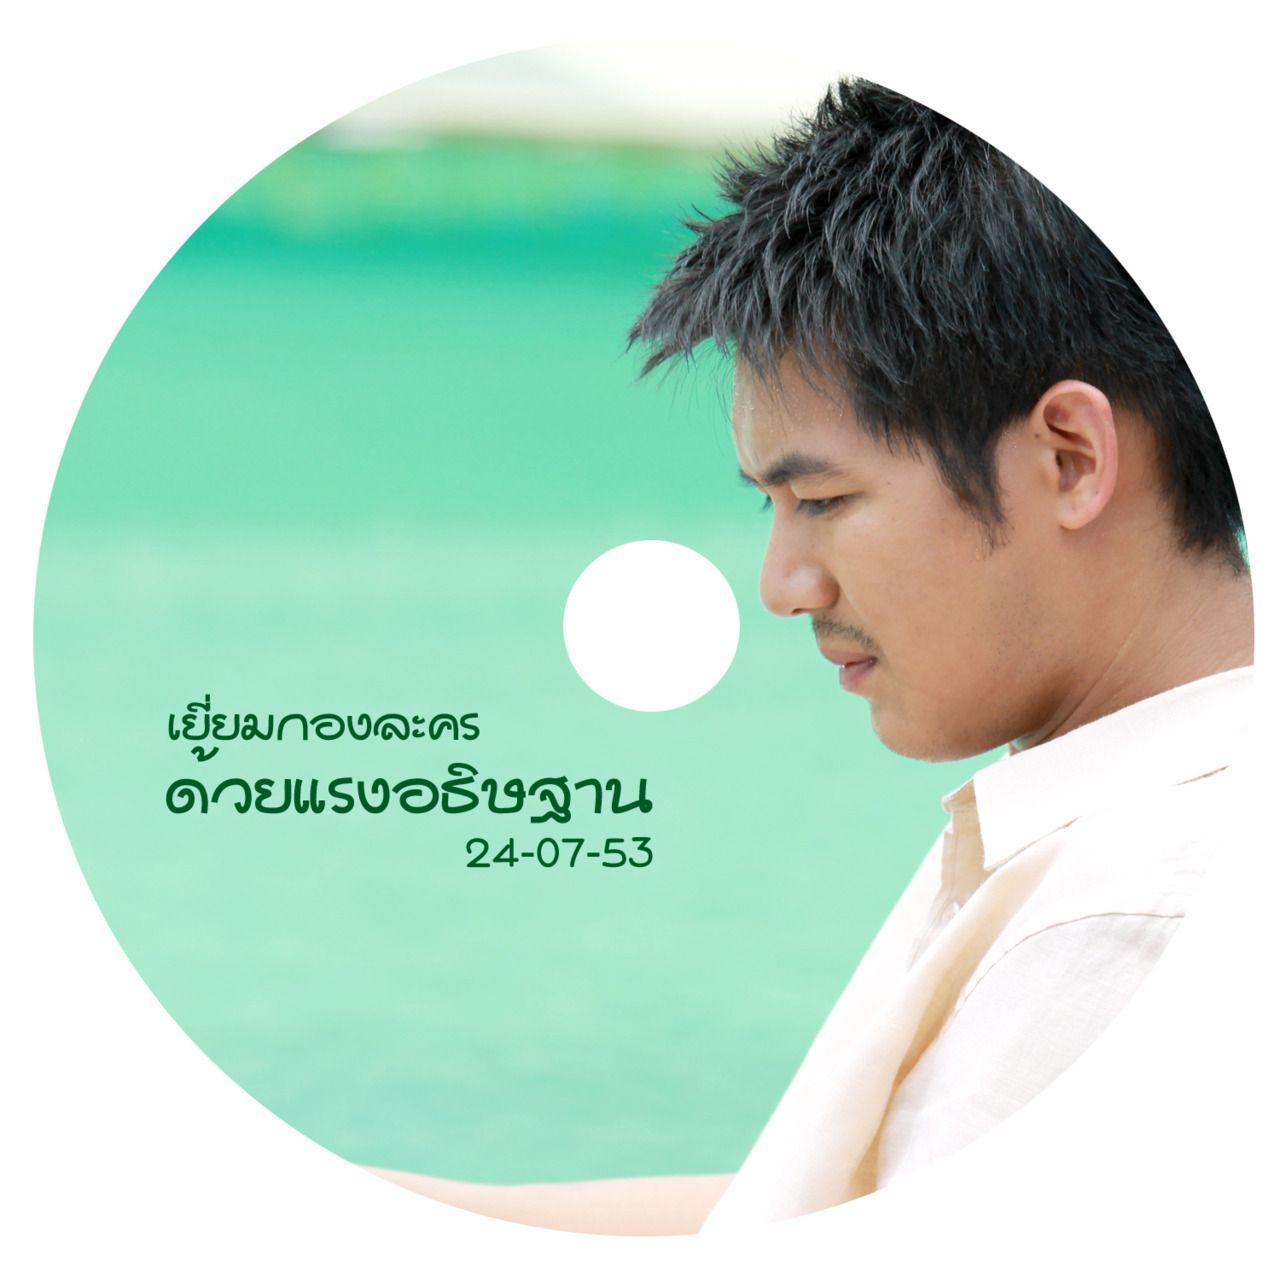 Pin by KDramaGeek on THAI ACTORS / ACTRESS / SINGERS/ MOVIES/LAKORN